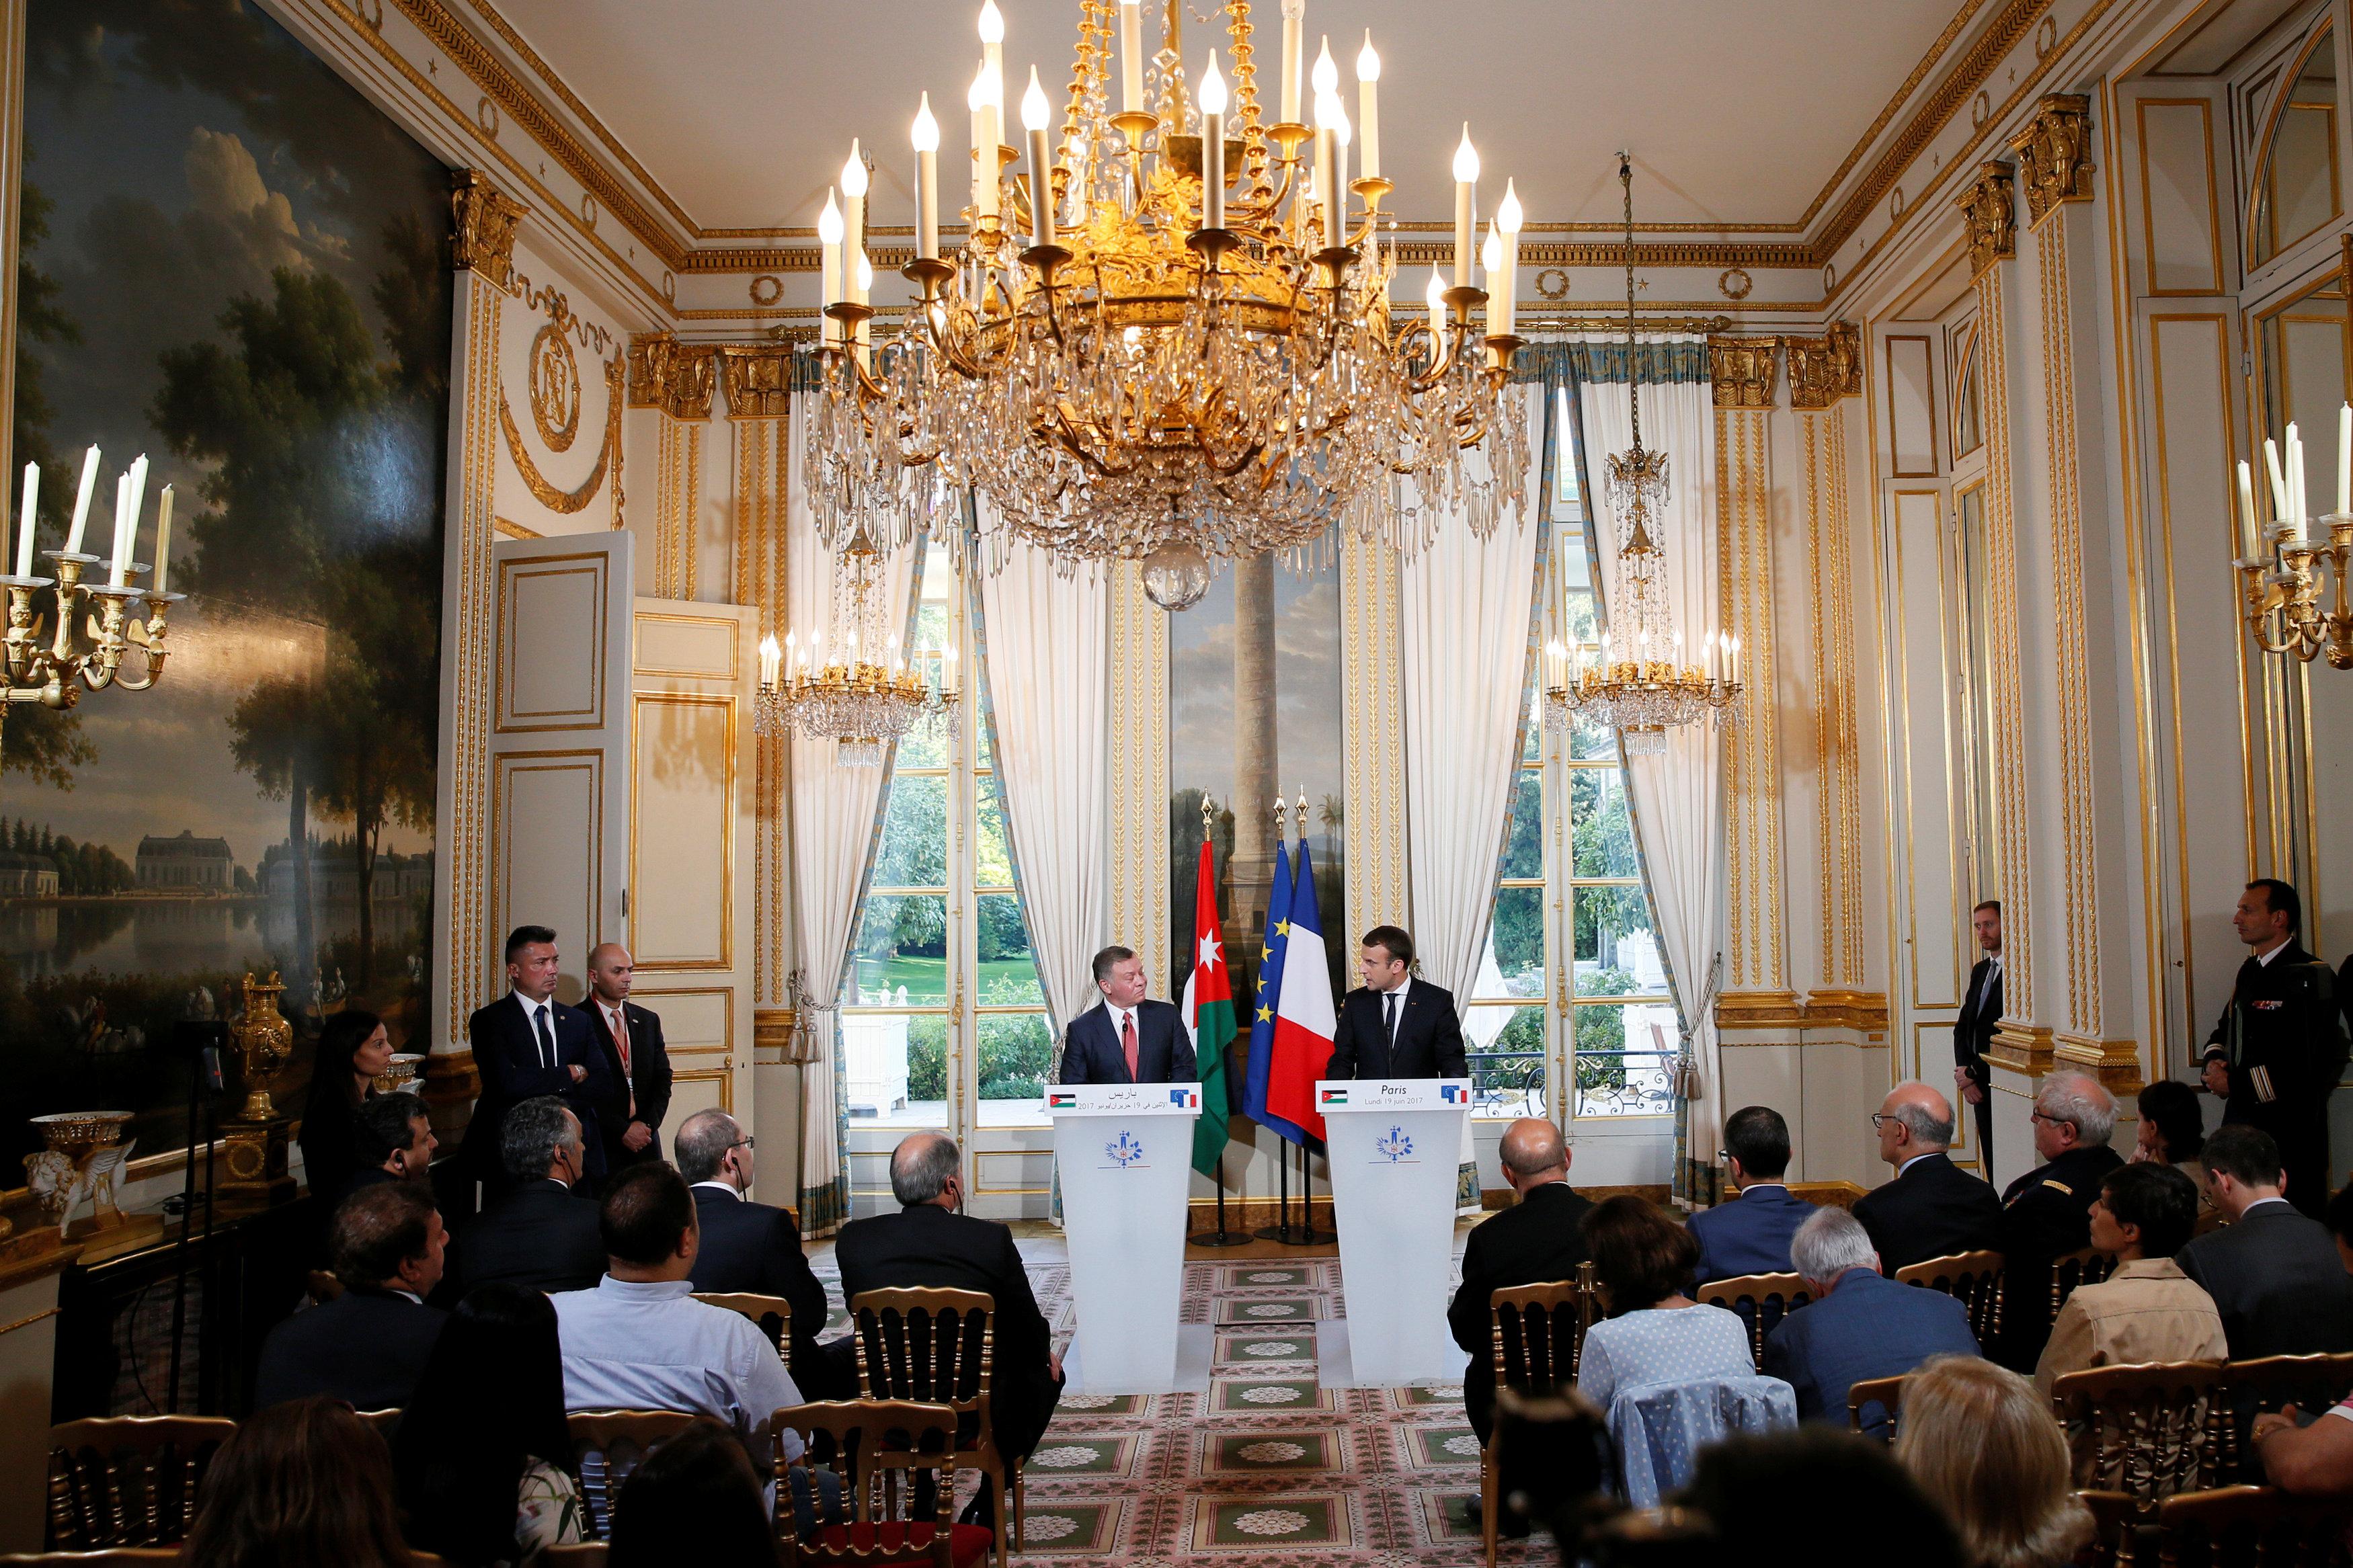 مؤتمر صحفى مشترك فى باريس